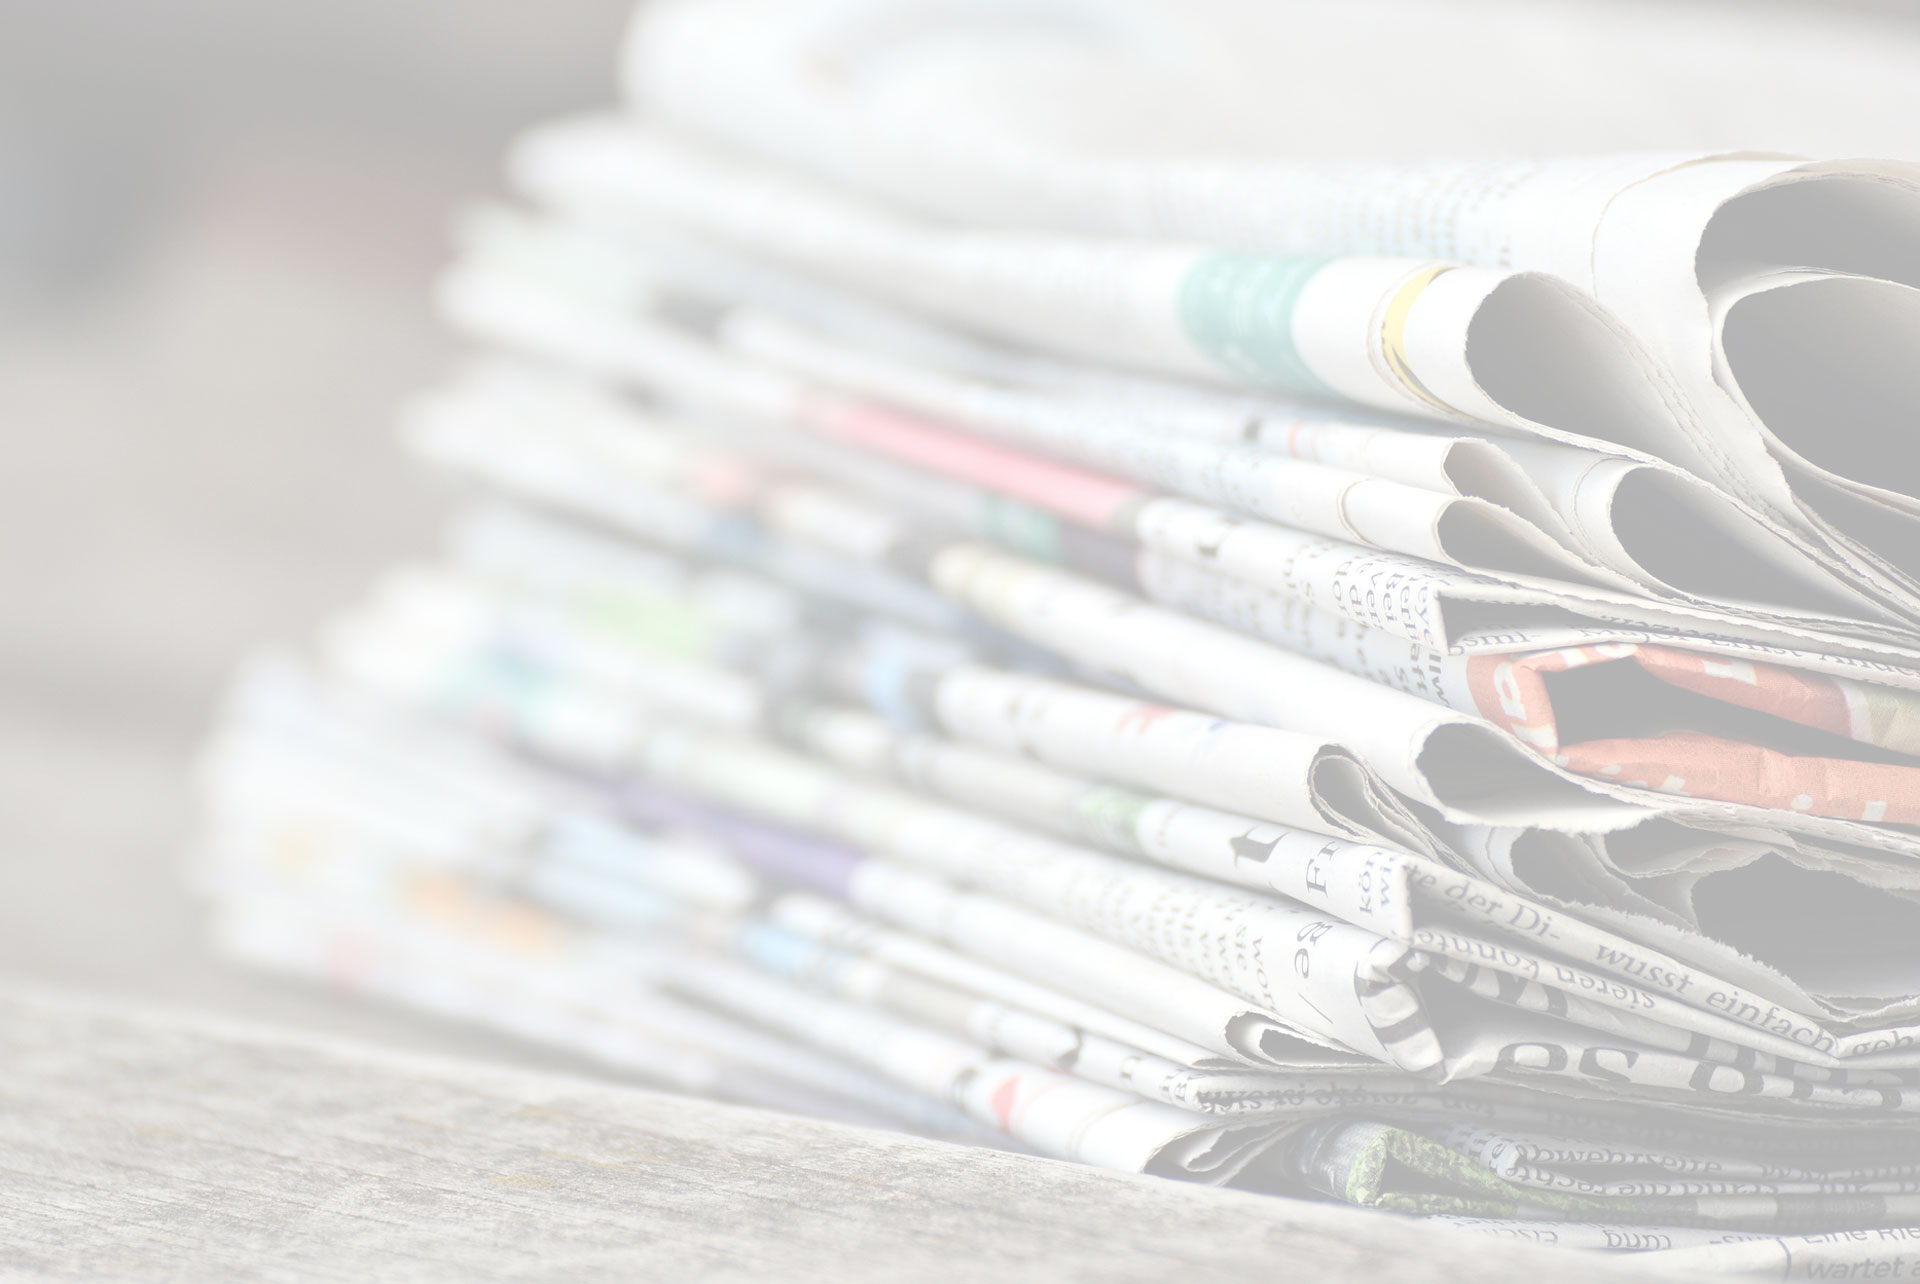 Milan-Uefa, due ore di udienza: ansia per la sentenza